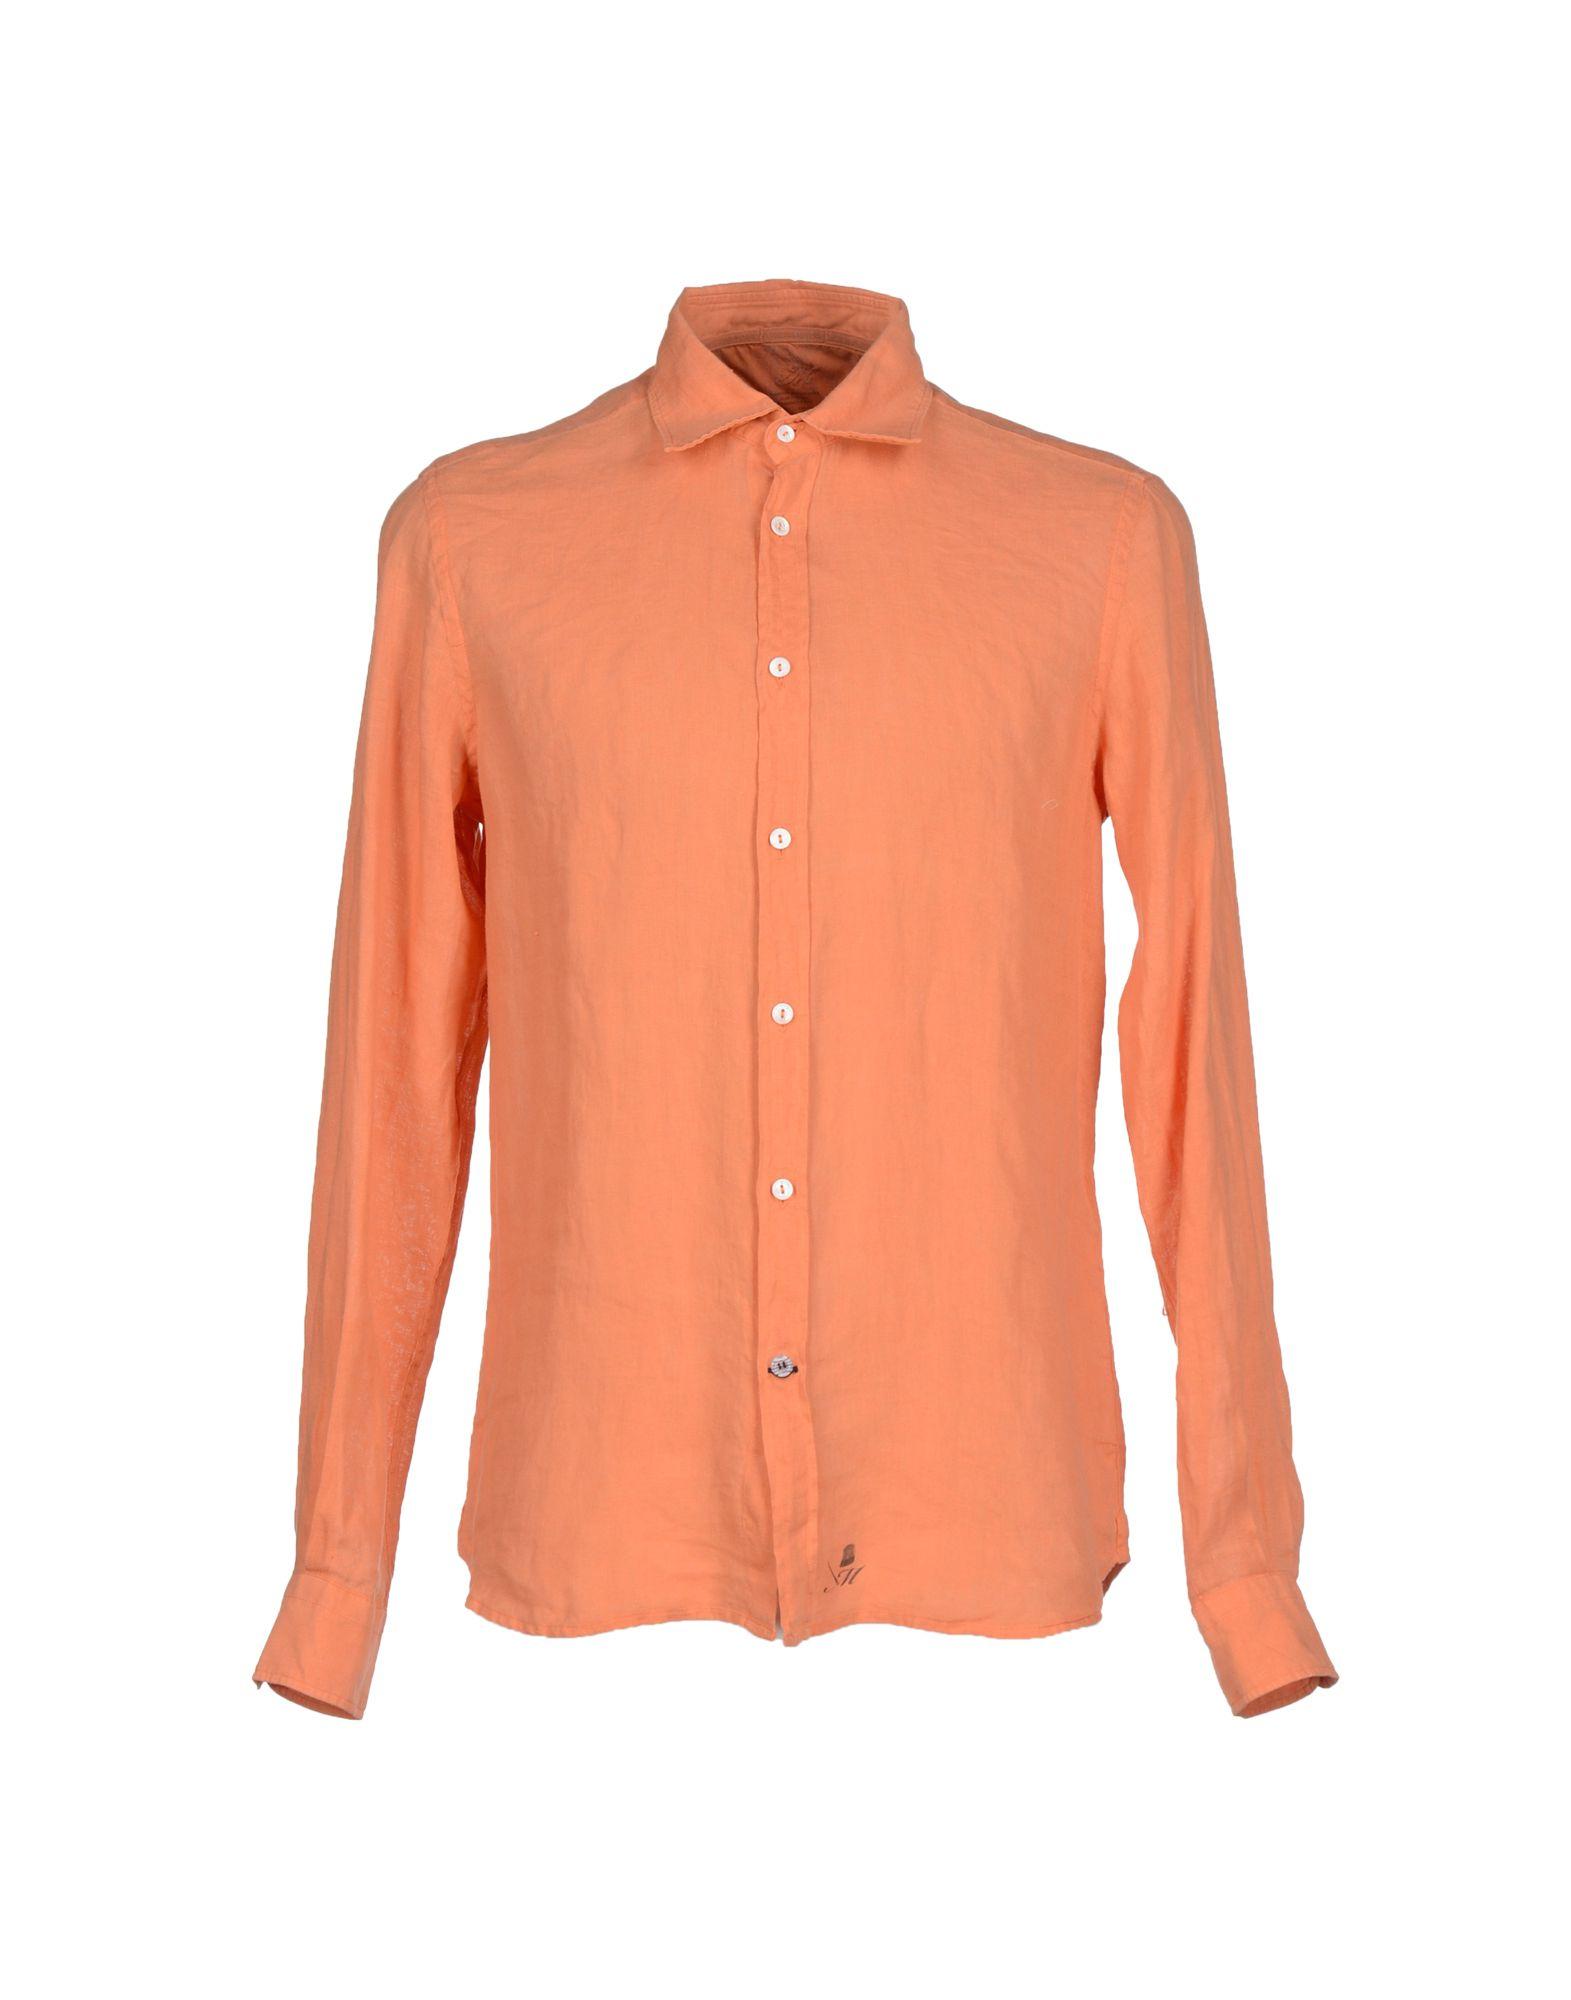 mason 39 s shirt in orange for men lyst ForMason S Men S Shirts